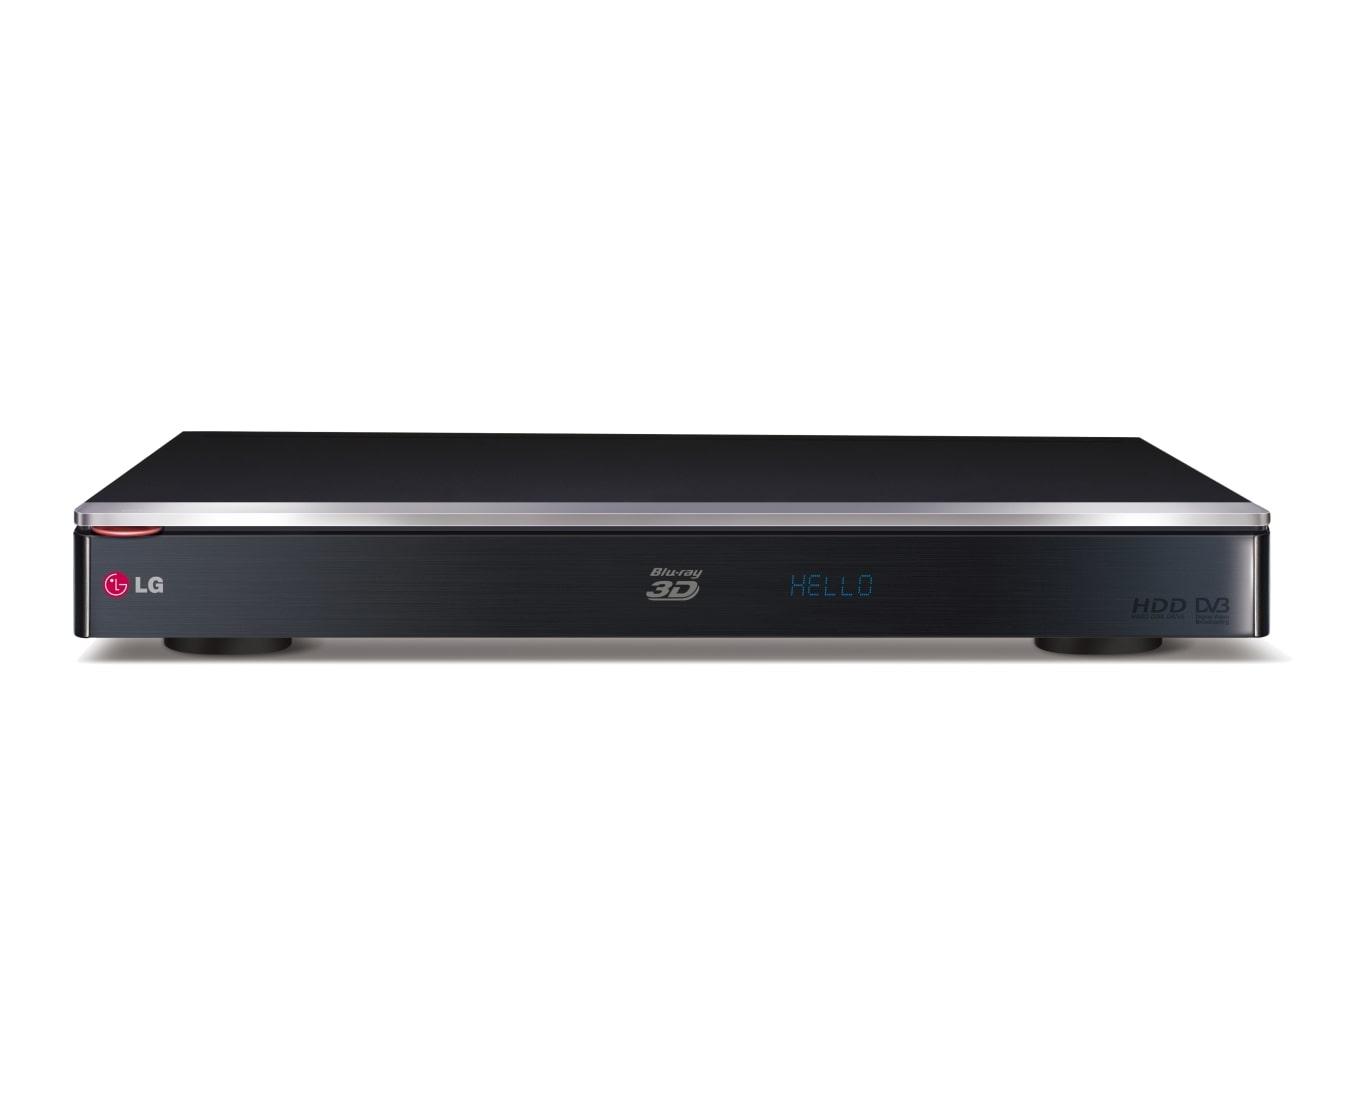 HR945T - 500GB Twin HD Tuner HDD Recorder with Blu-ray Player | LG Australia